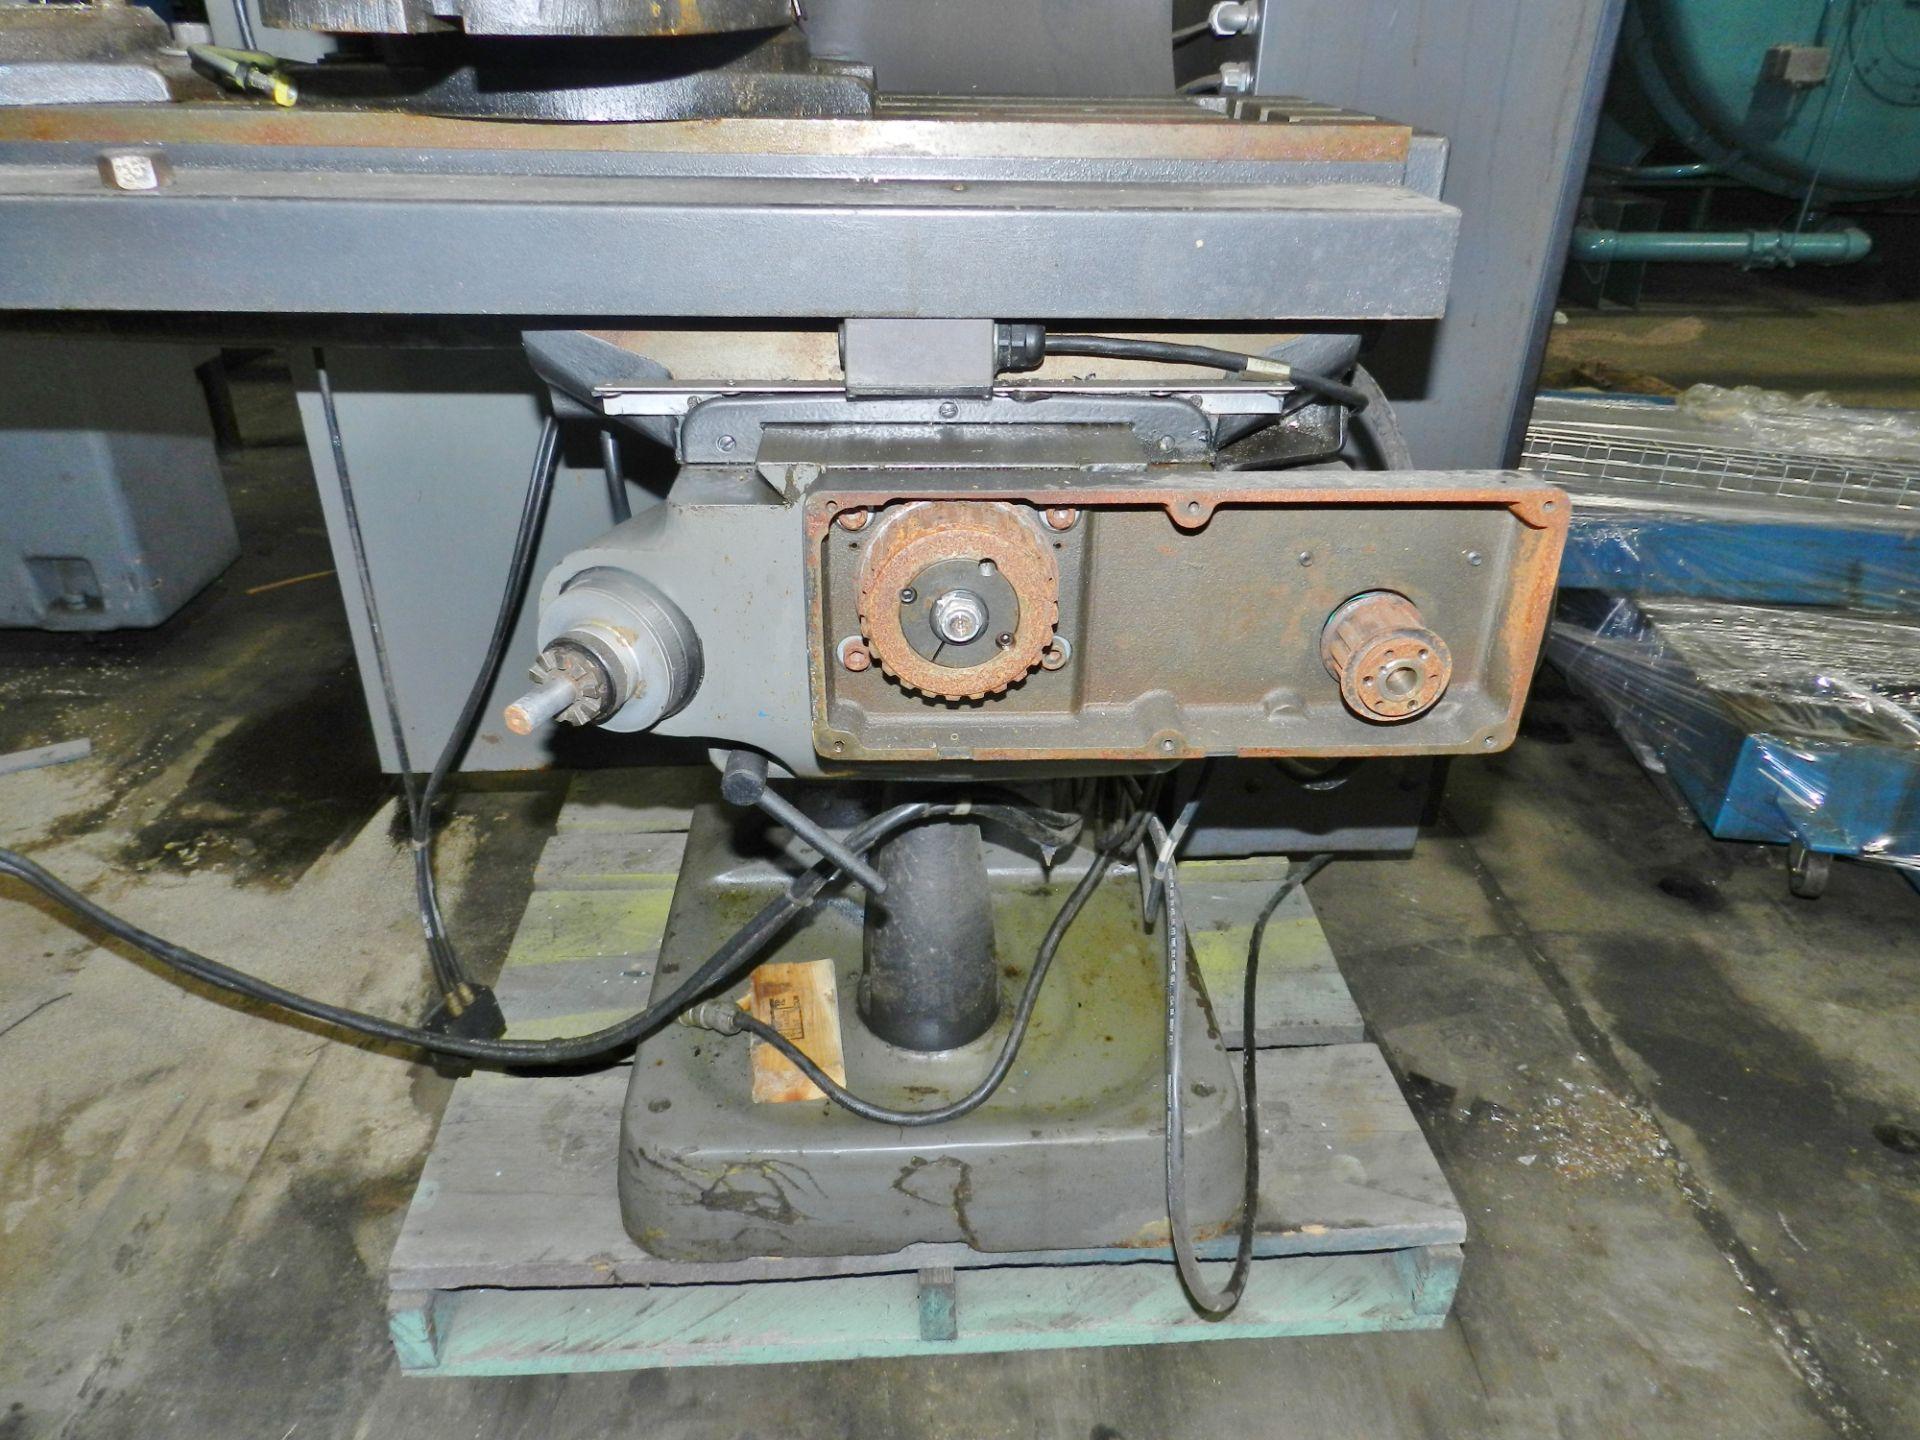 Lot 55 - Bridgeport V2XT 3 Axis Milling Machine